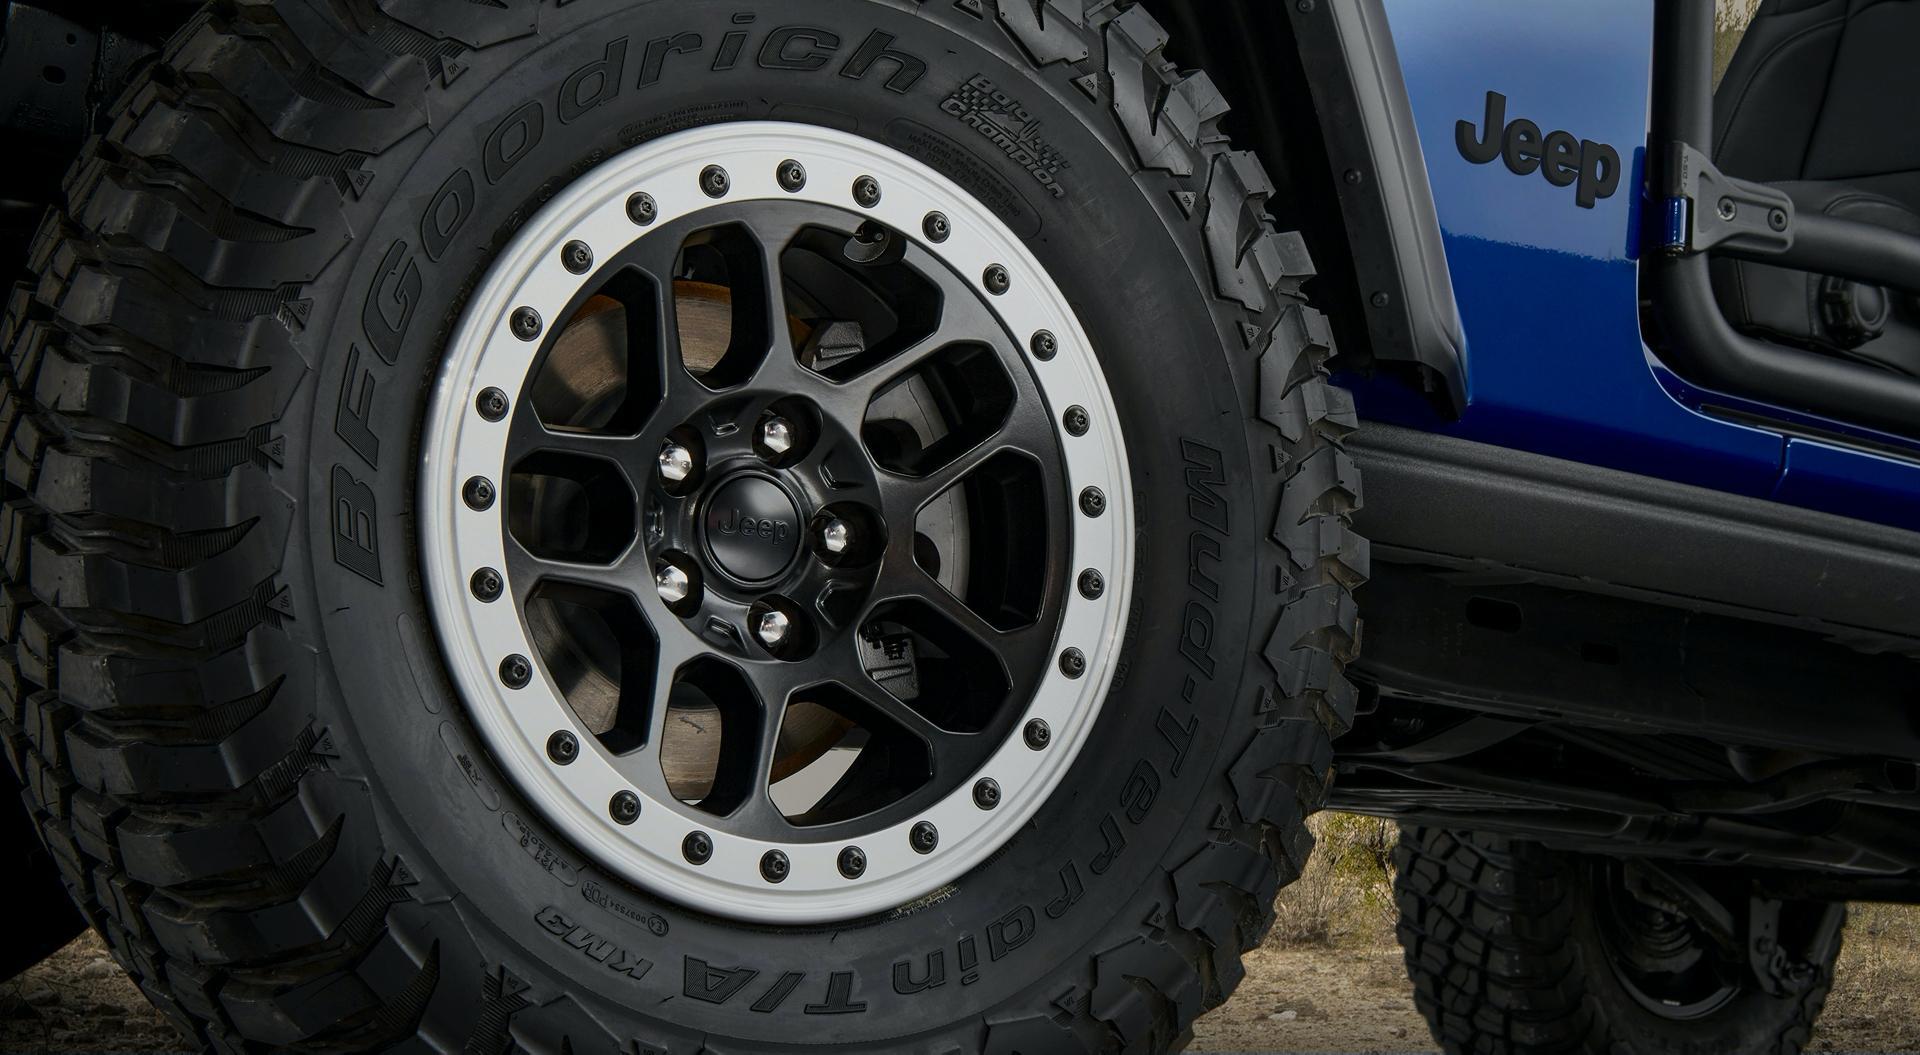 Jeep-Wrangler-JPP-20-Limited-Edition-7